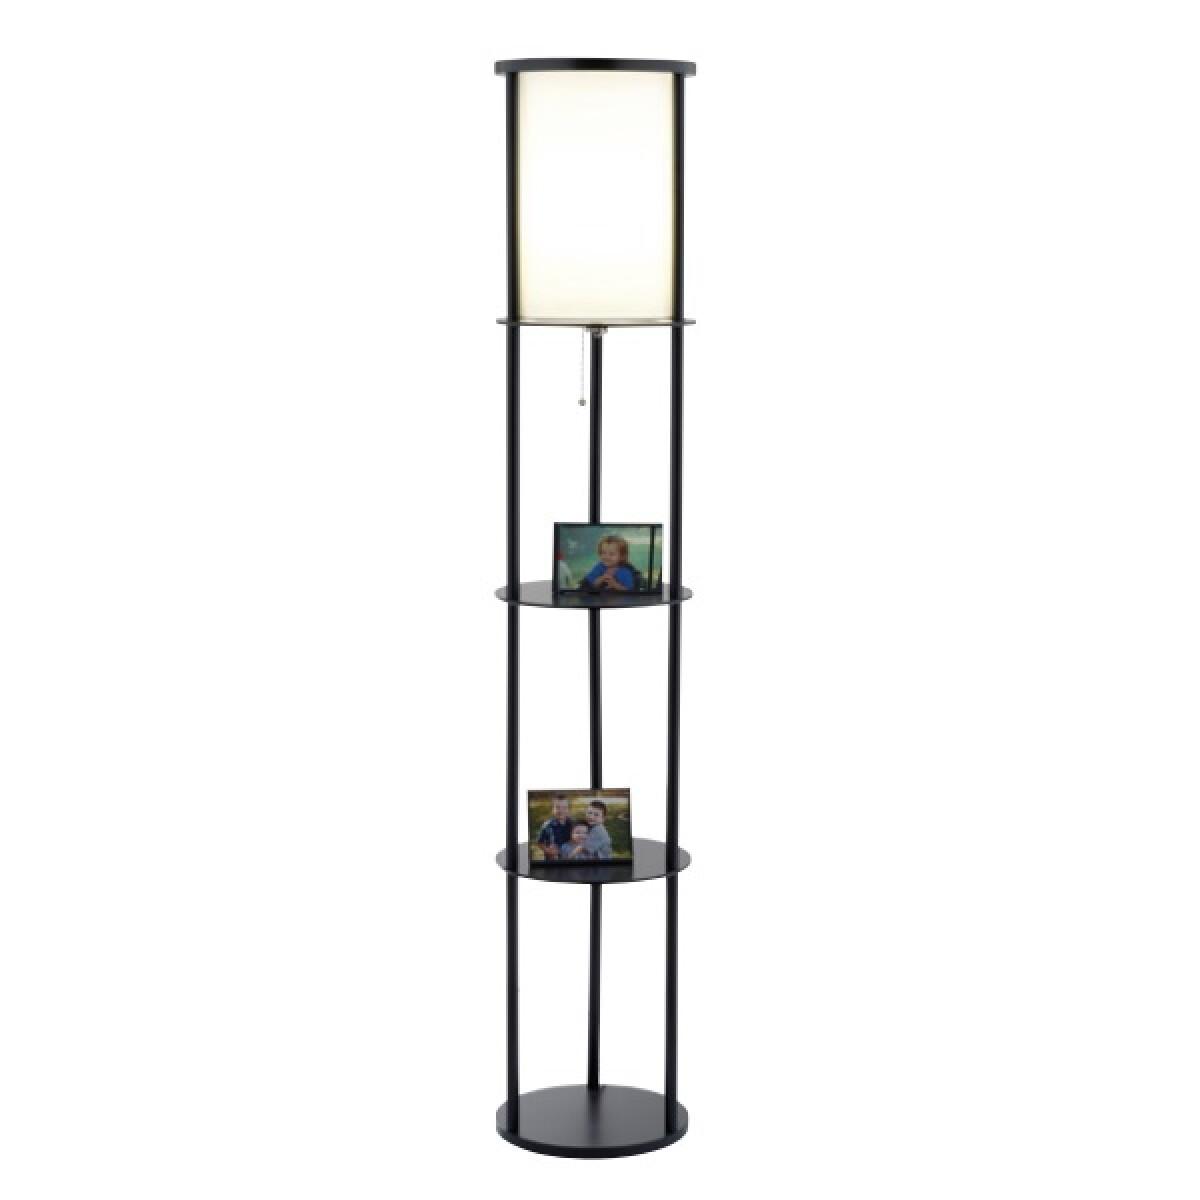 Adesso 1 Light Shelf Floor Lamp